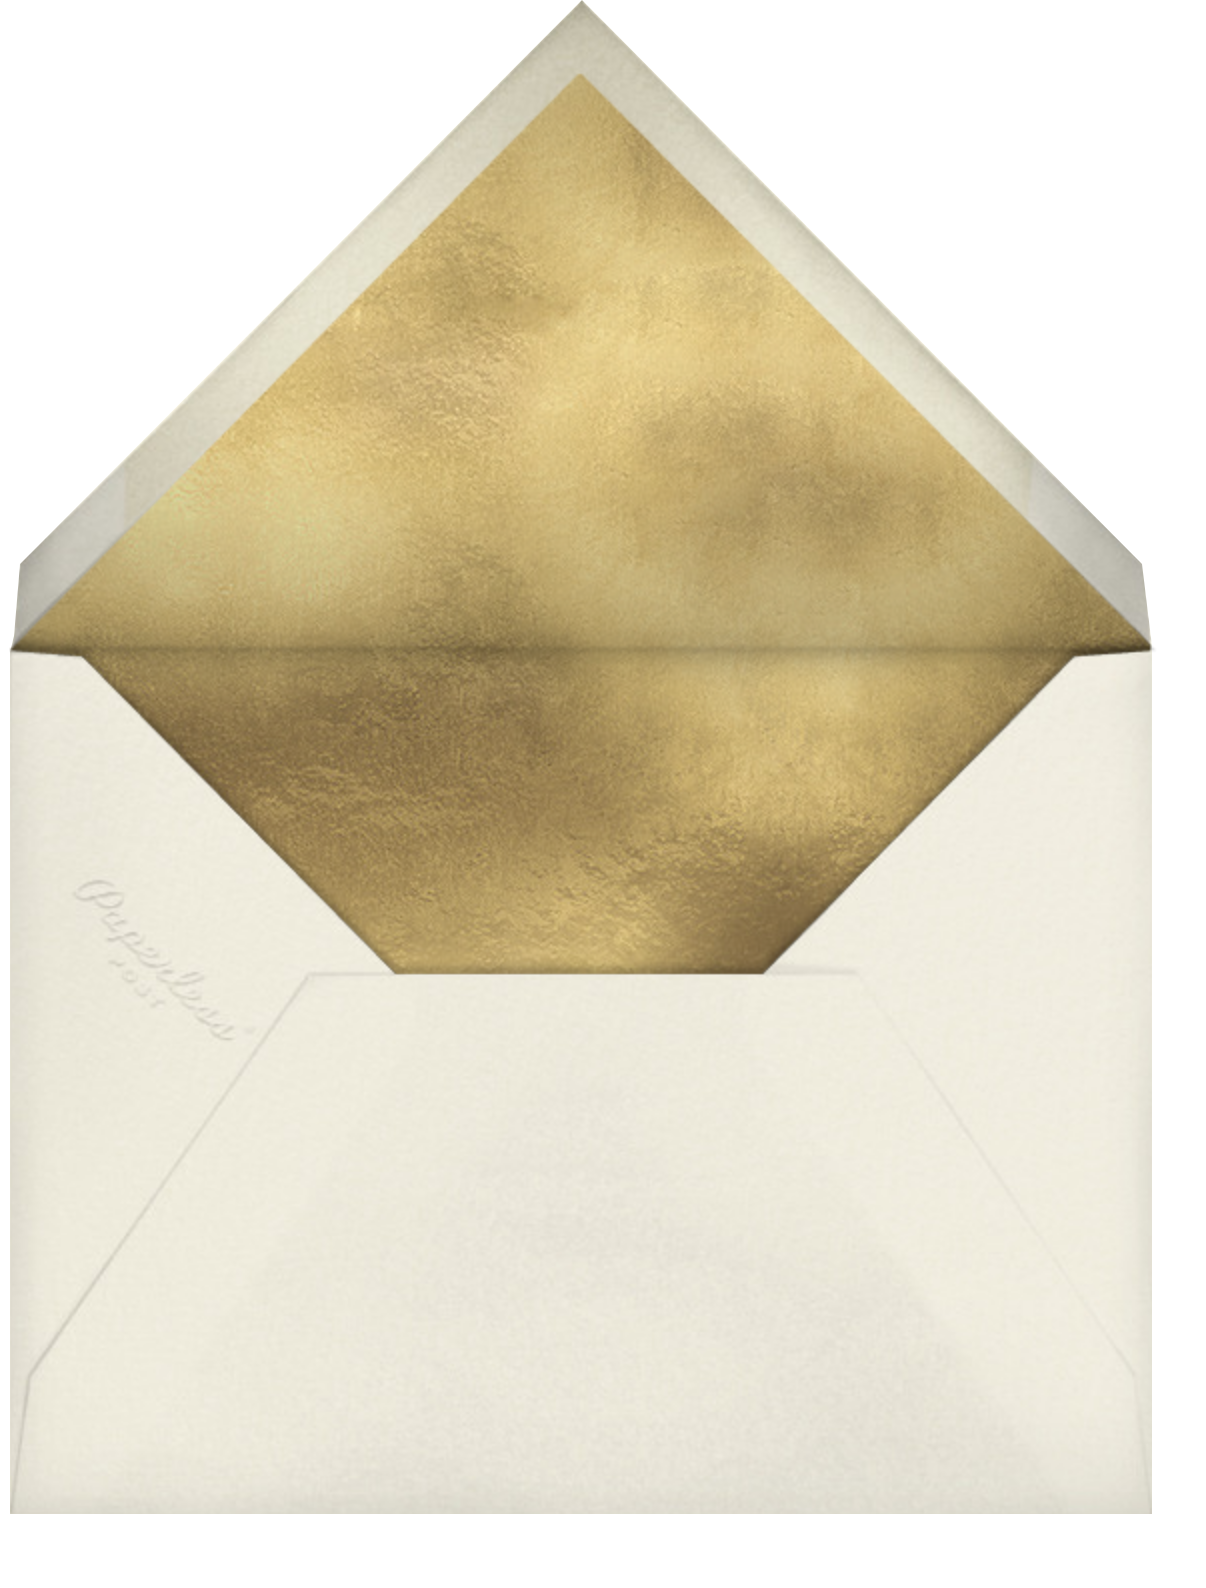 Aripan - Paperless Post - Envelope